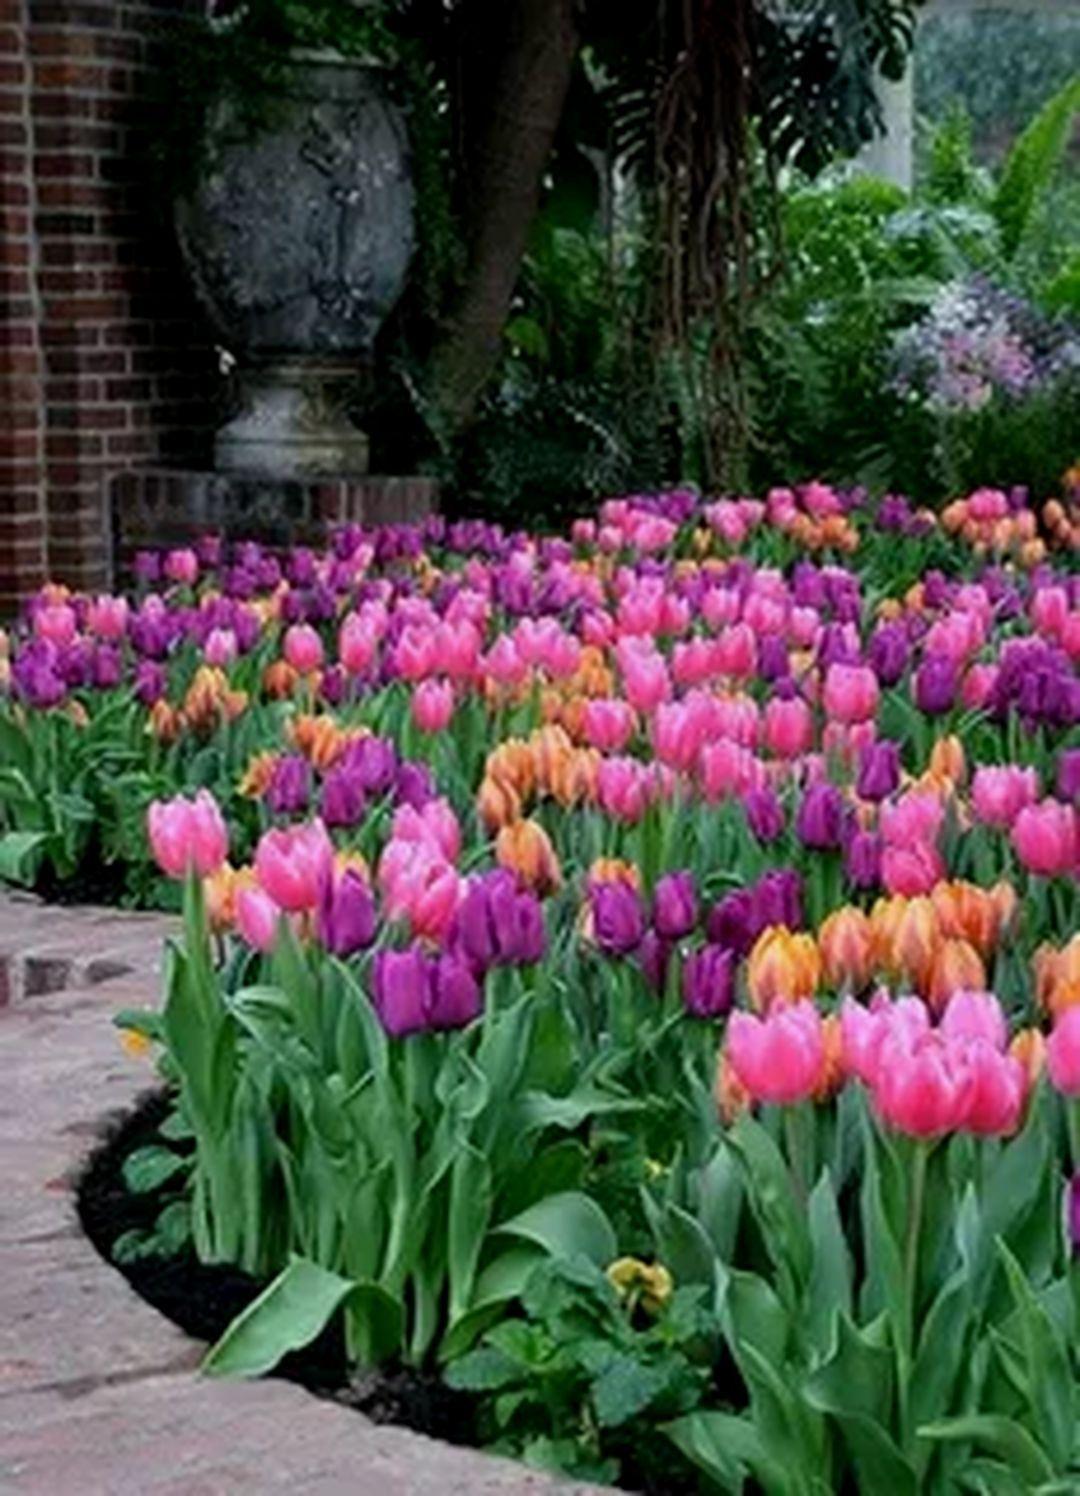 15 Beautiful Flower Garden Arrangement For Amazing Home Ideas Decor It S Beautiful Flowers Garden Tulips Arrangement Tulips Garden